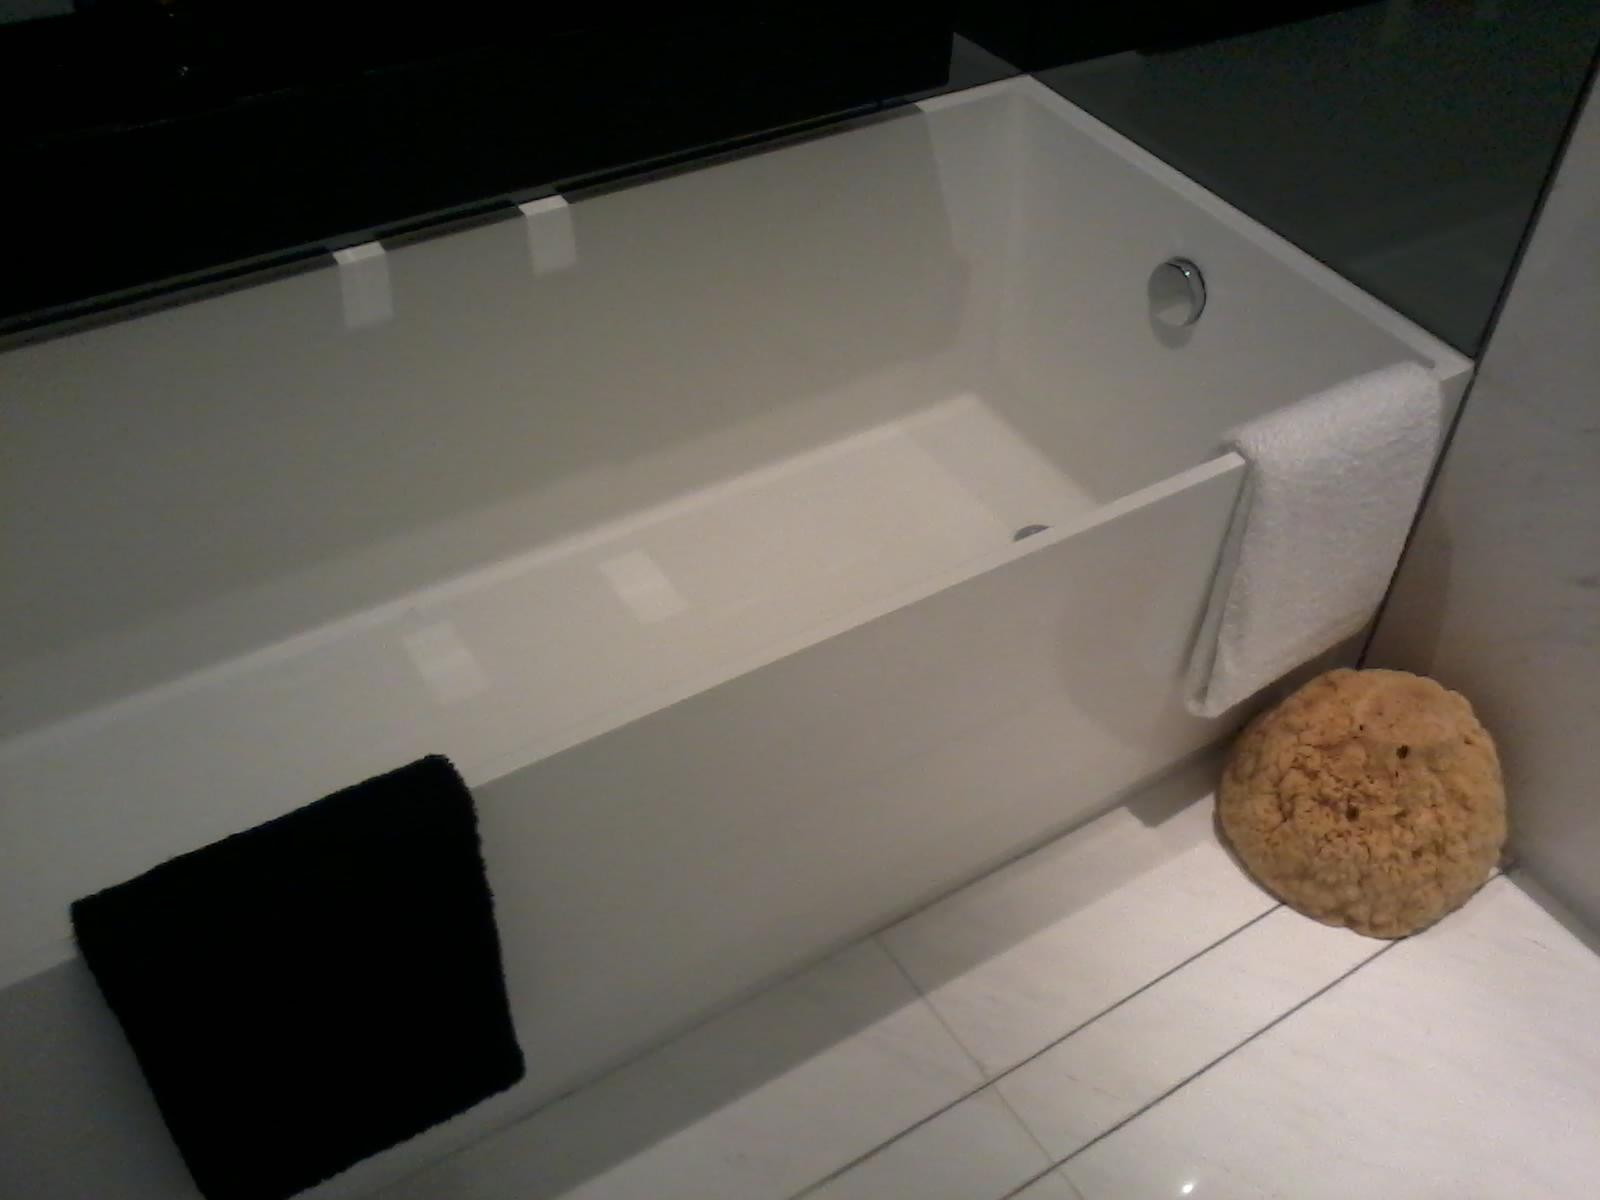 File hk central ifc 21th floor double cove show flat bathroom interior bathtub oct 2012 jpg